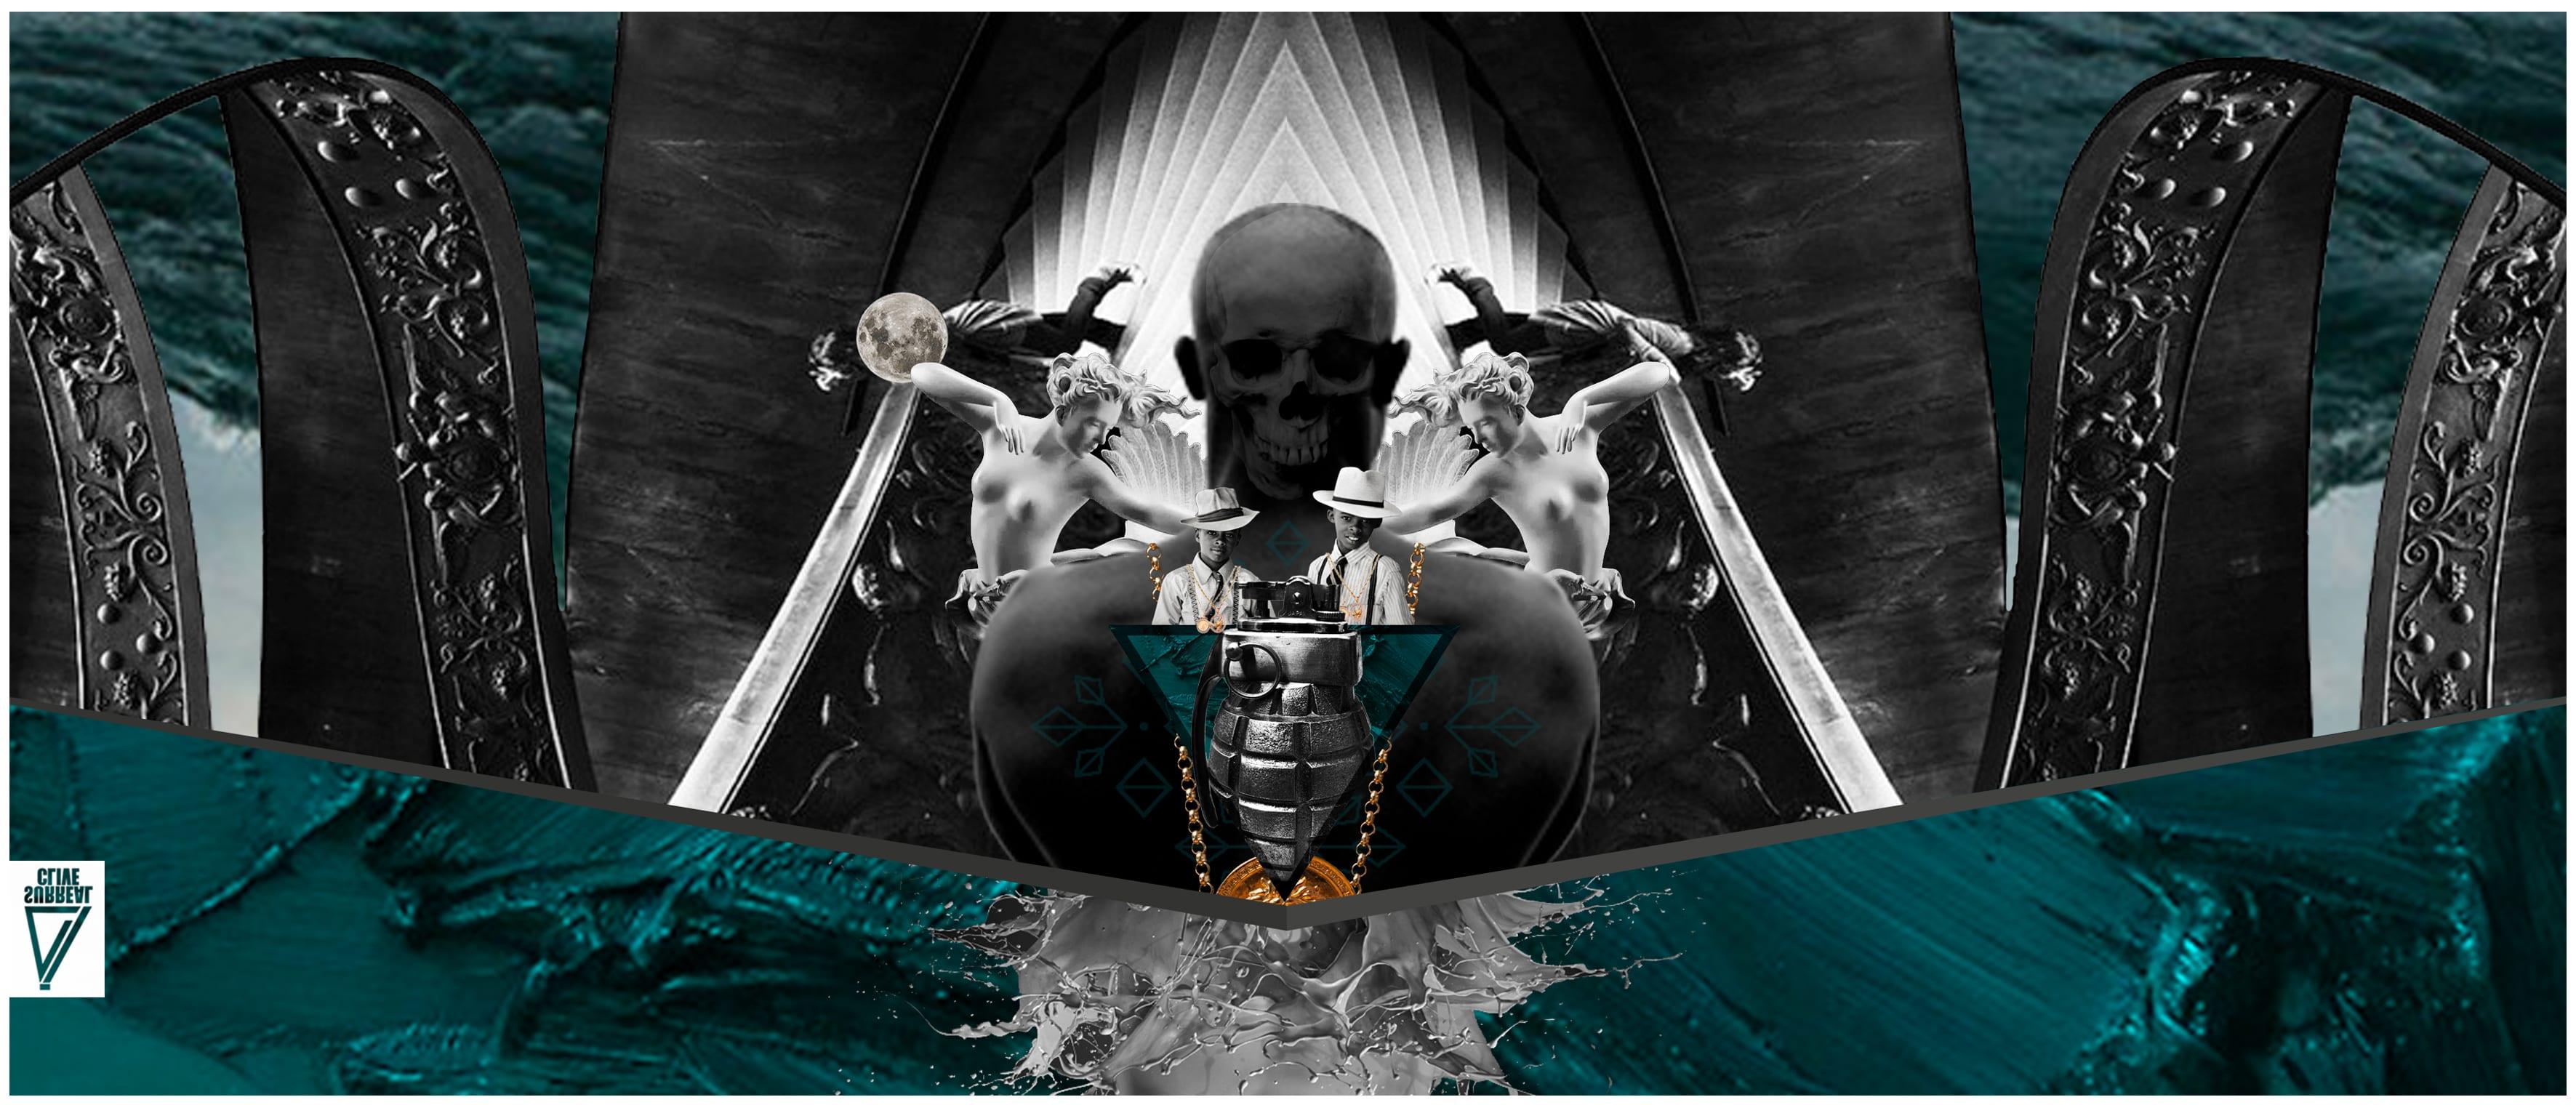 Parallel Psyche © Clivert Thibela